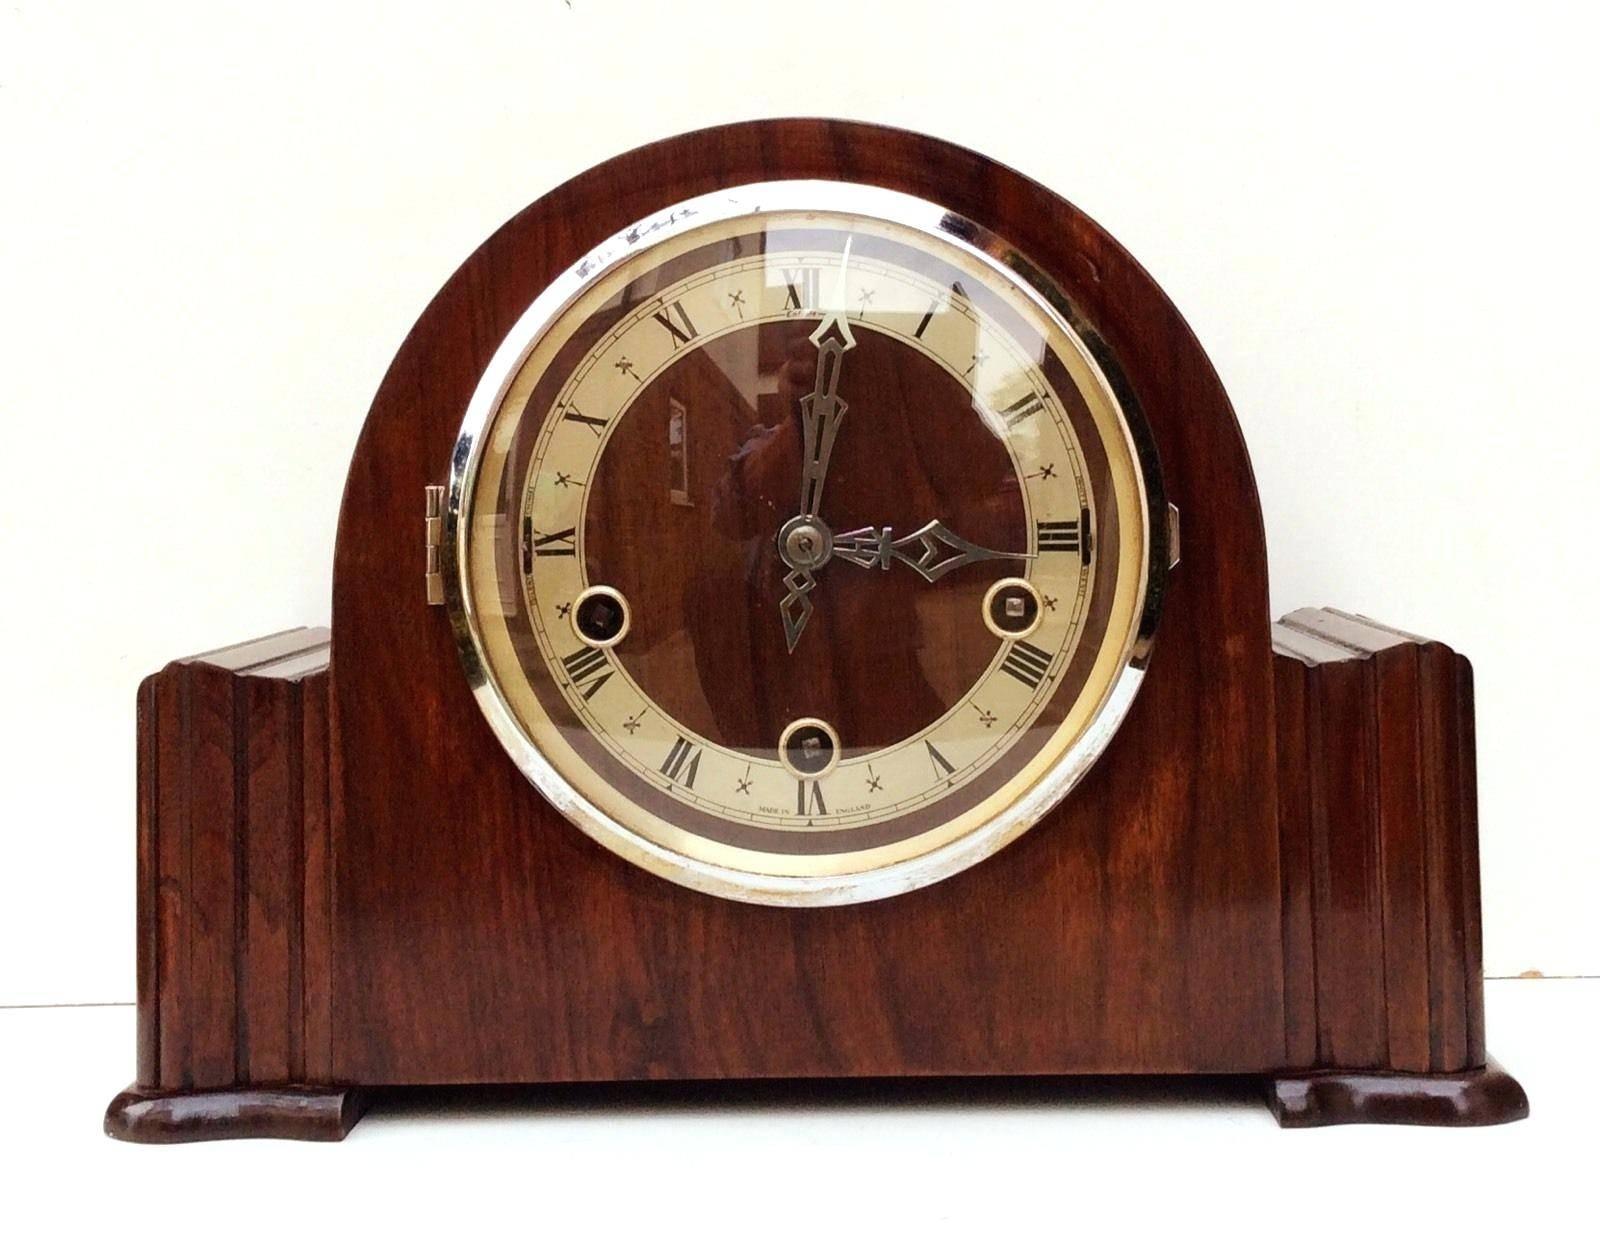 Wall Ideas : Art Deco Wall Clock Sticker Art Deco Wall Clocks Ebay Regarding Recent Large Art Deco Wall Clocks (View 7 of 30)